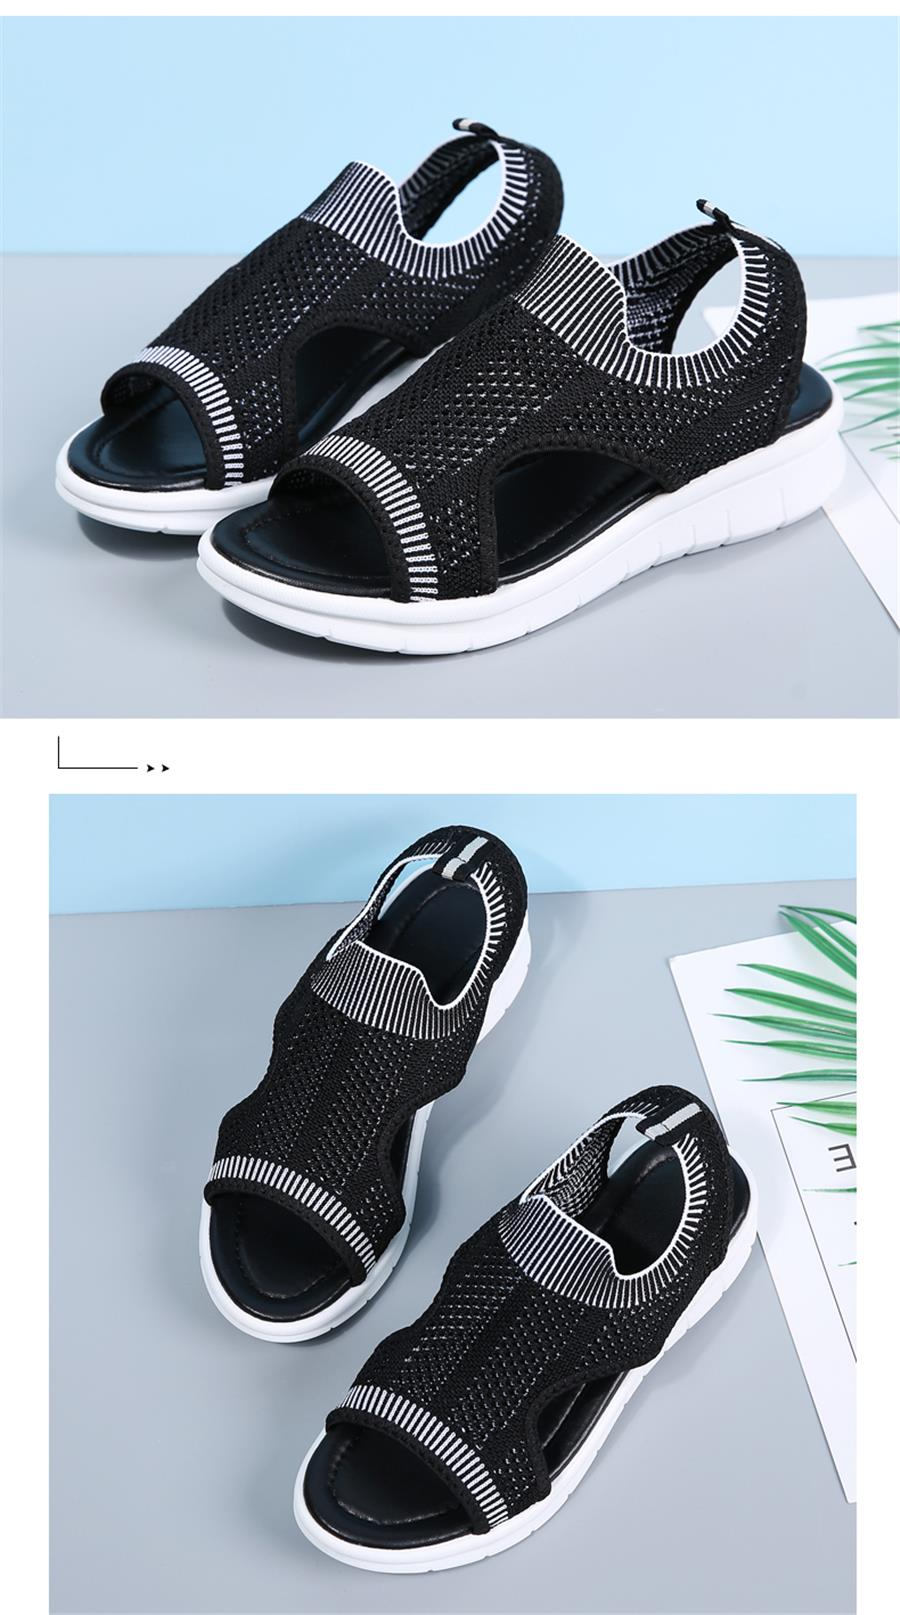 HTB1H9JjRXzqK1RjSZFvq6AB7VXaC STQ Women sandals 2019 female shoes women summer wedge comfort sandals ladies flat slingback flat sandals women sandalias 7739